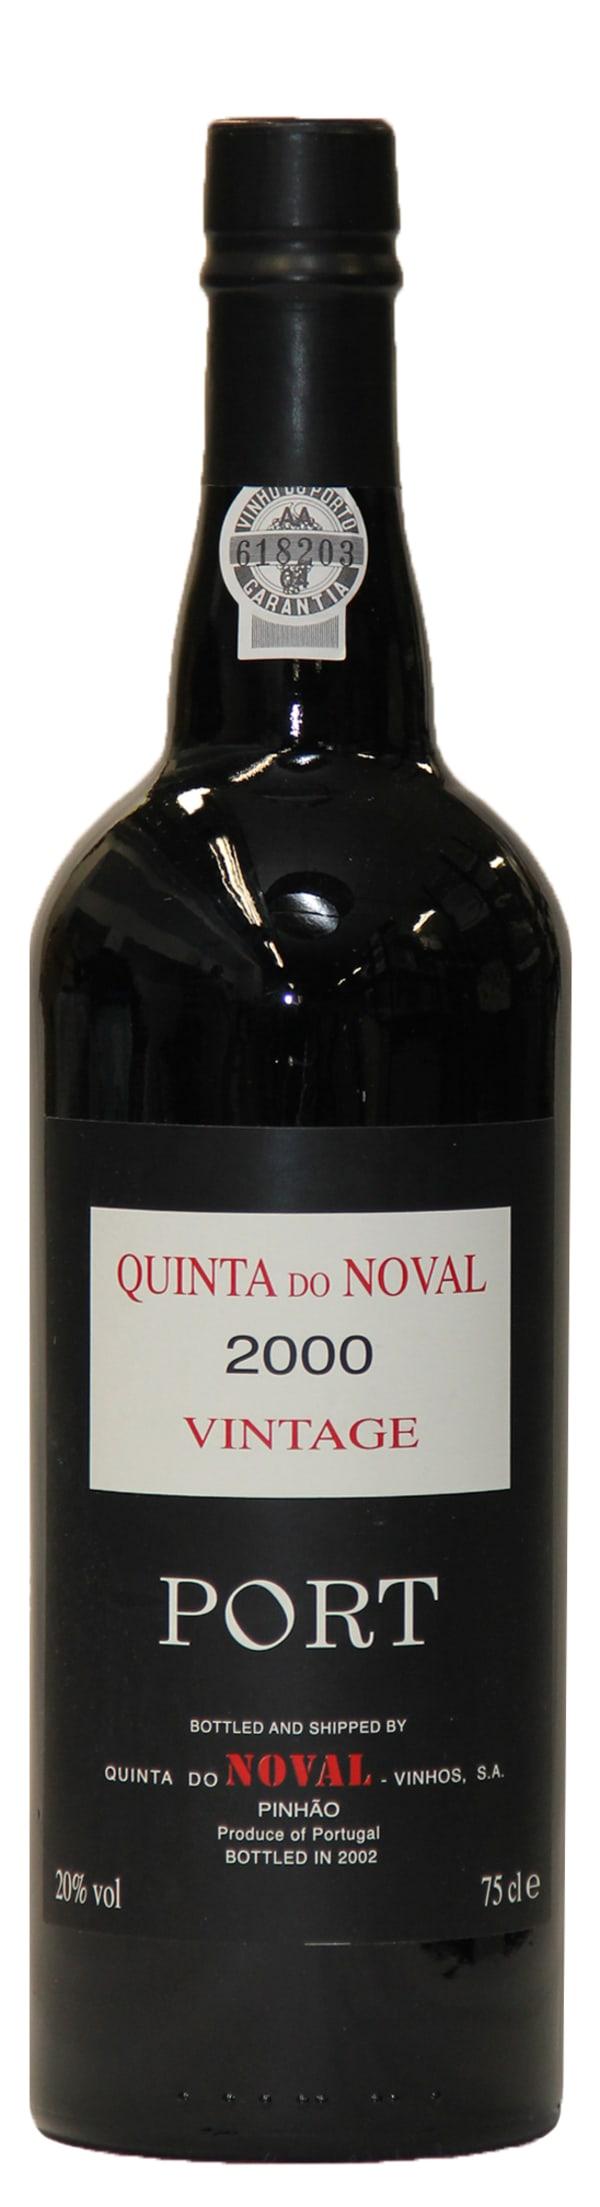 Quinta do Noval Vintage Port 2000